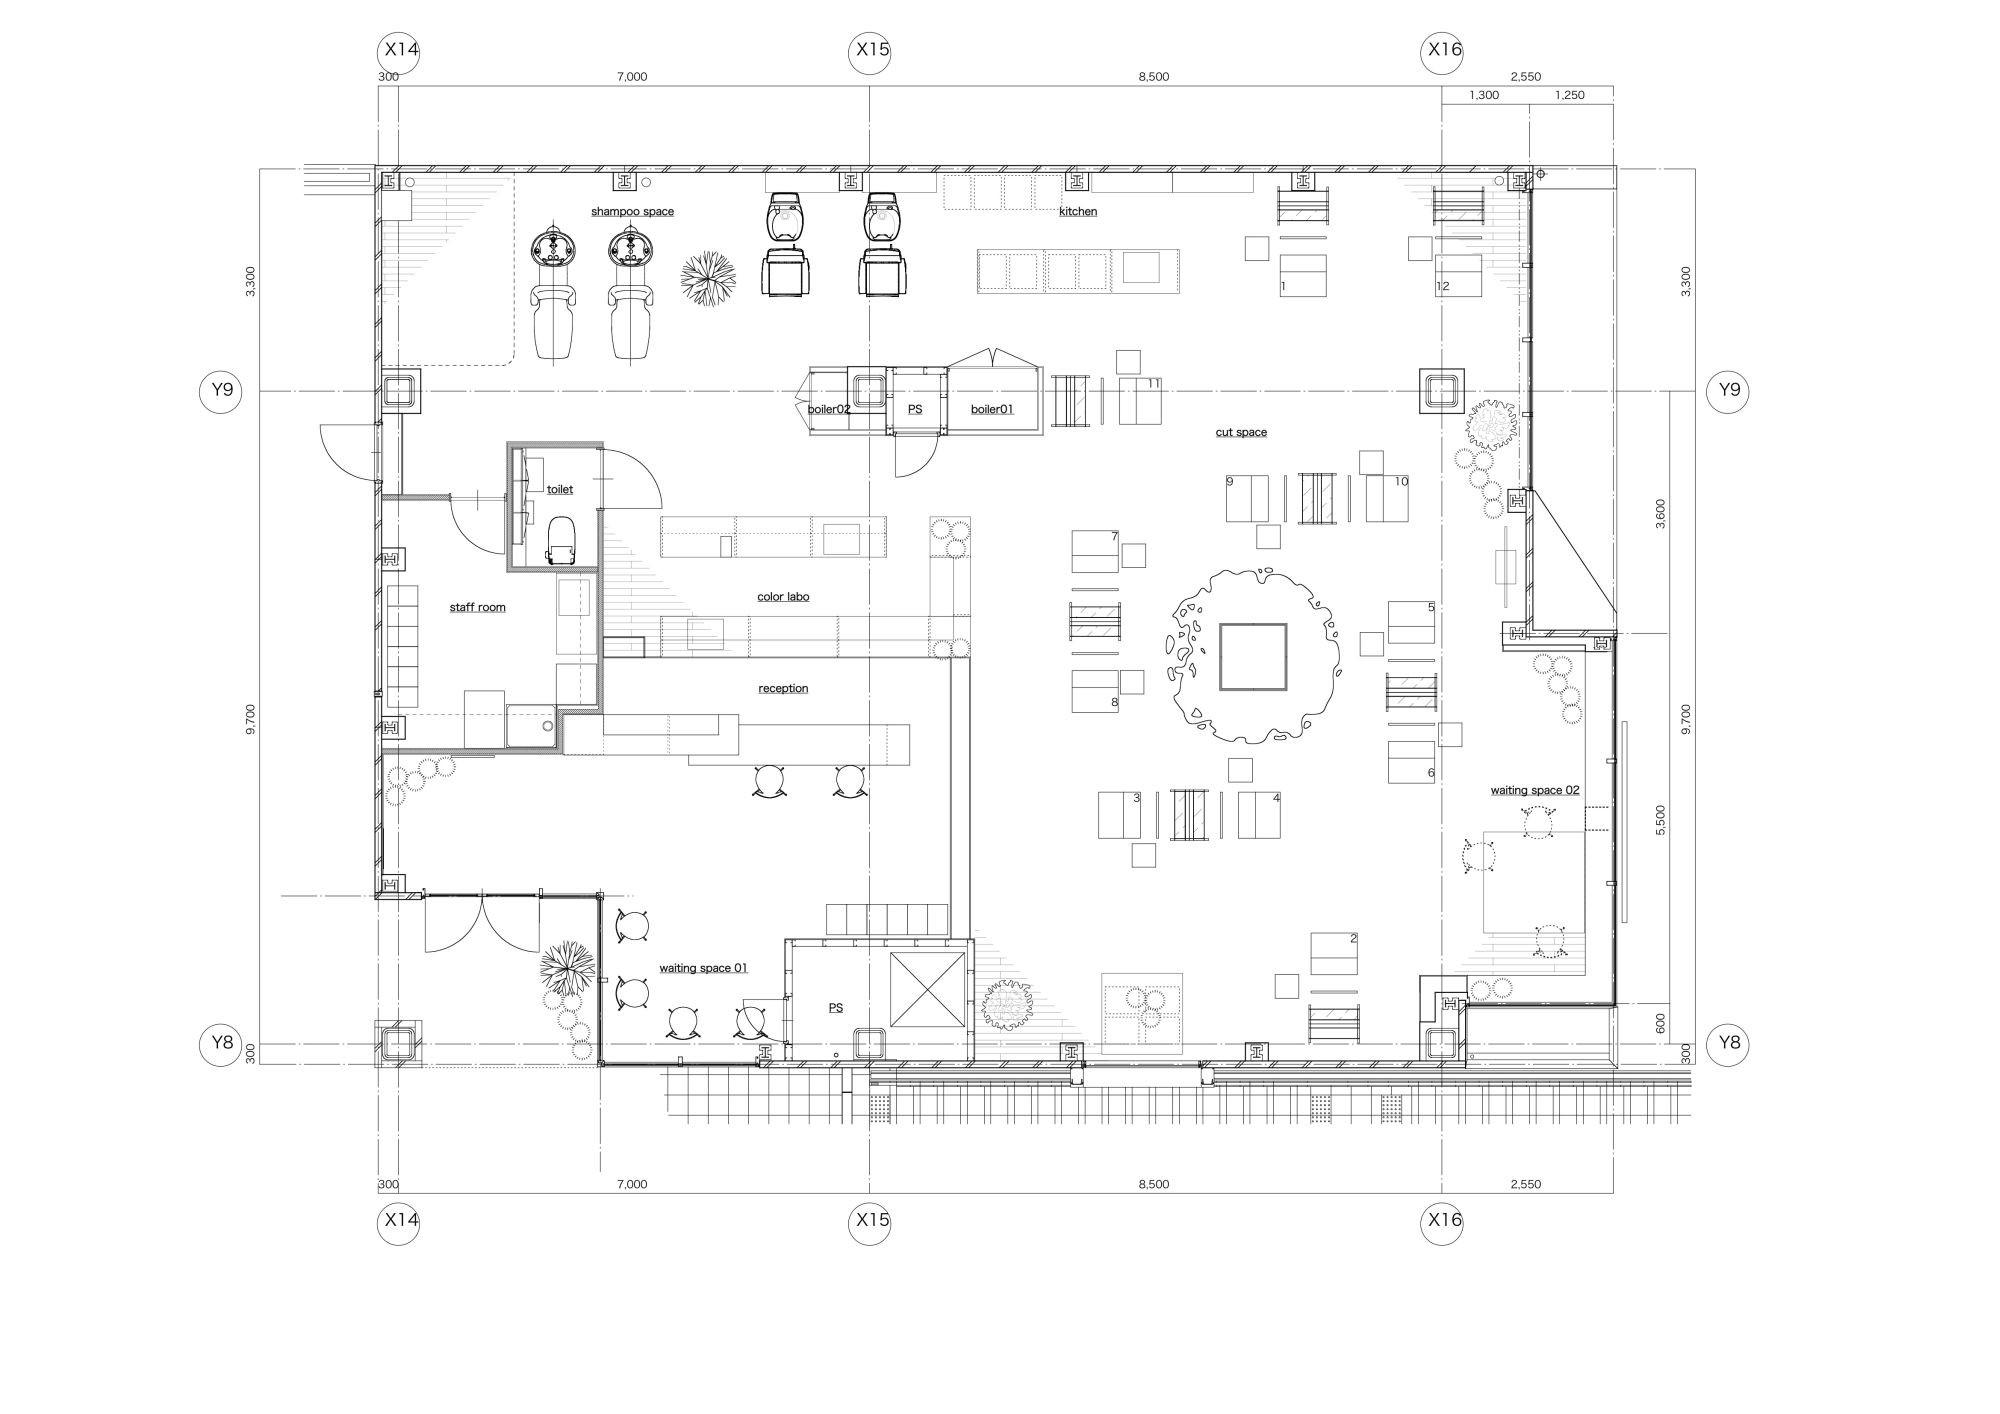 Rmmv Coffee House Interior Tileset 0 8: Small Barber Shop Floor Plans